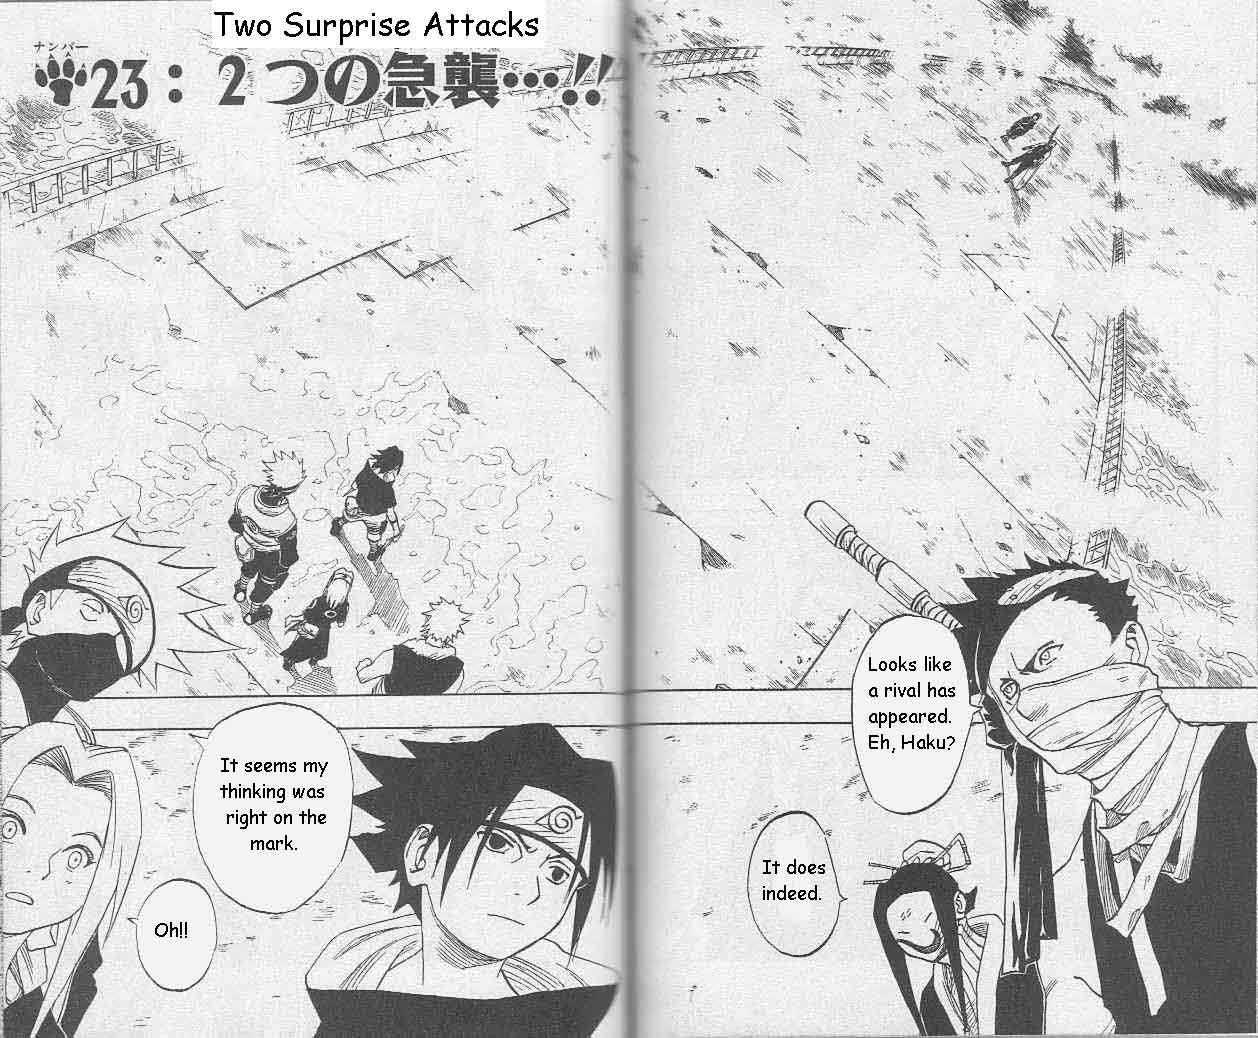 https://im.nineanime.com/comics/pic9/33/289/22237/Naruto230230.jpg Page 1